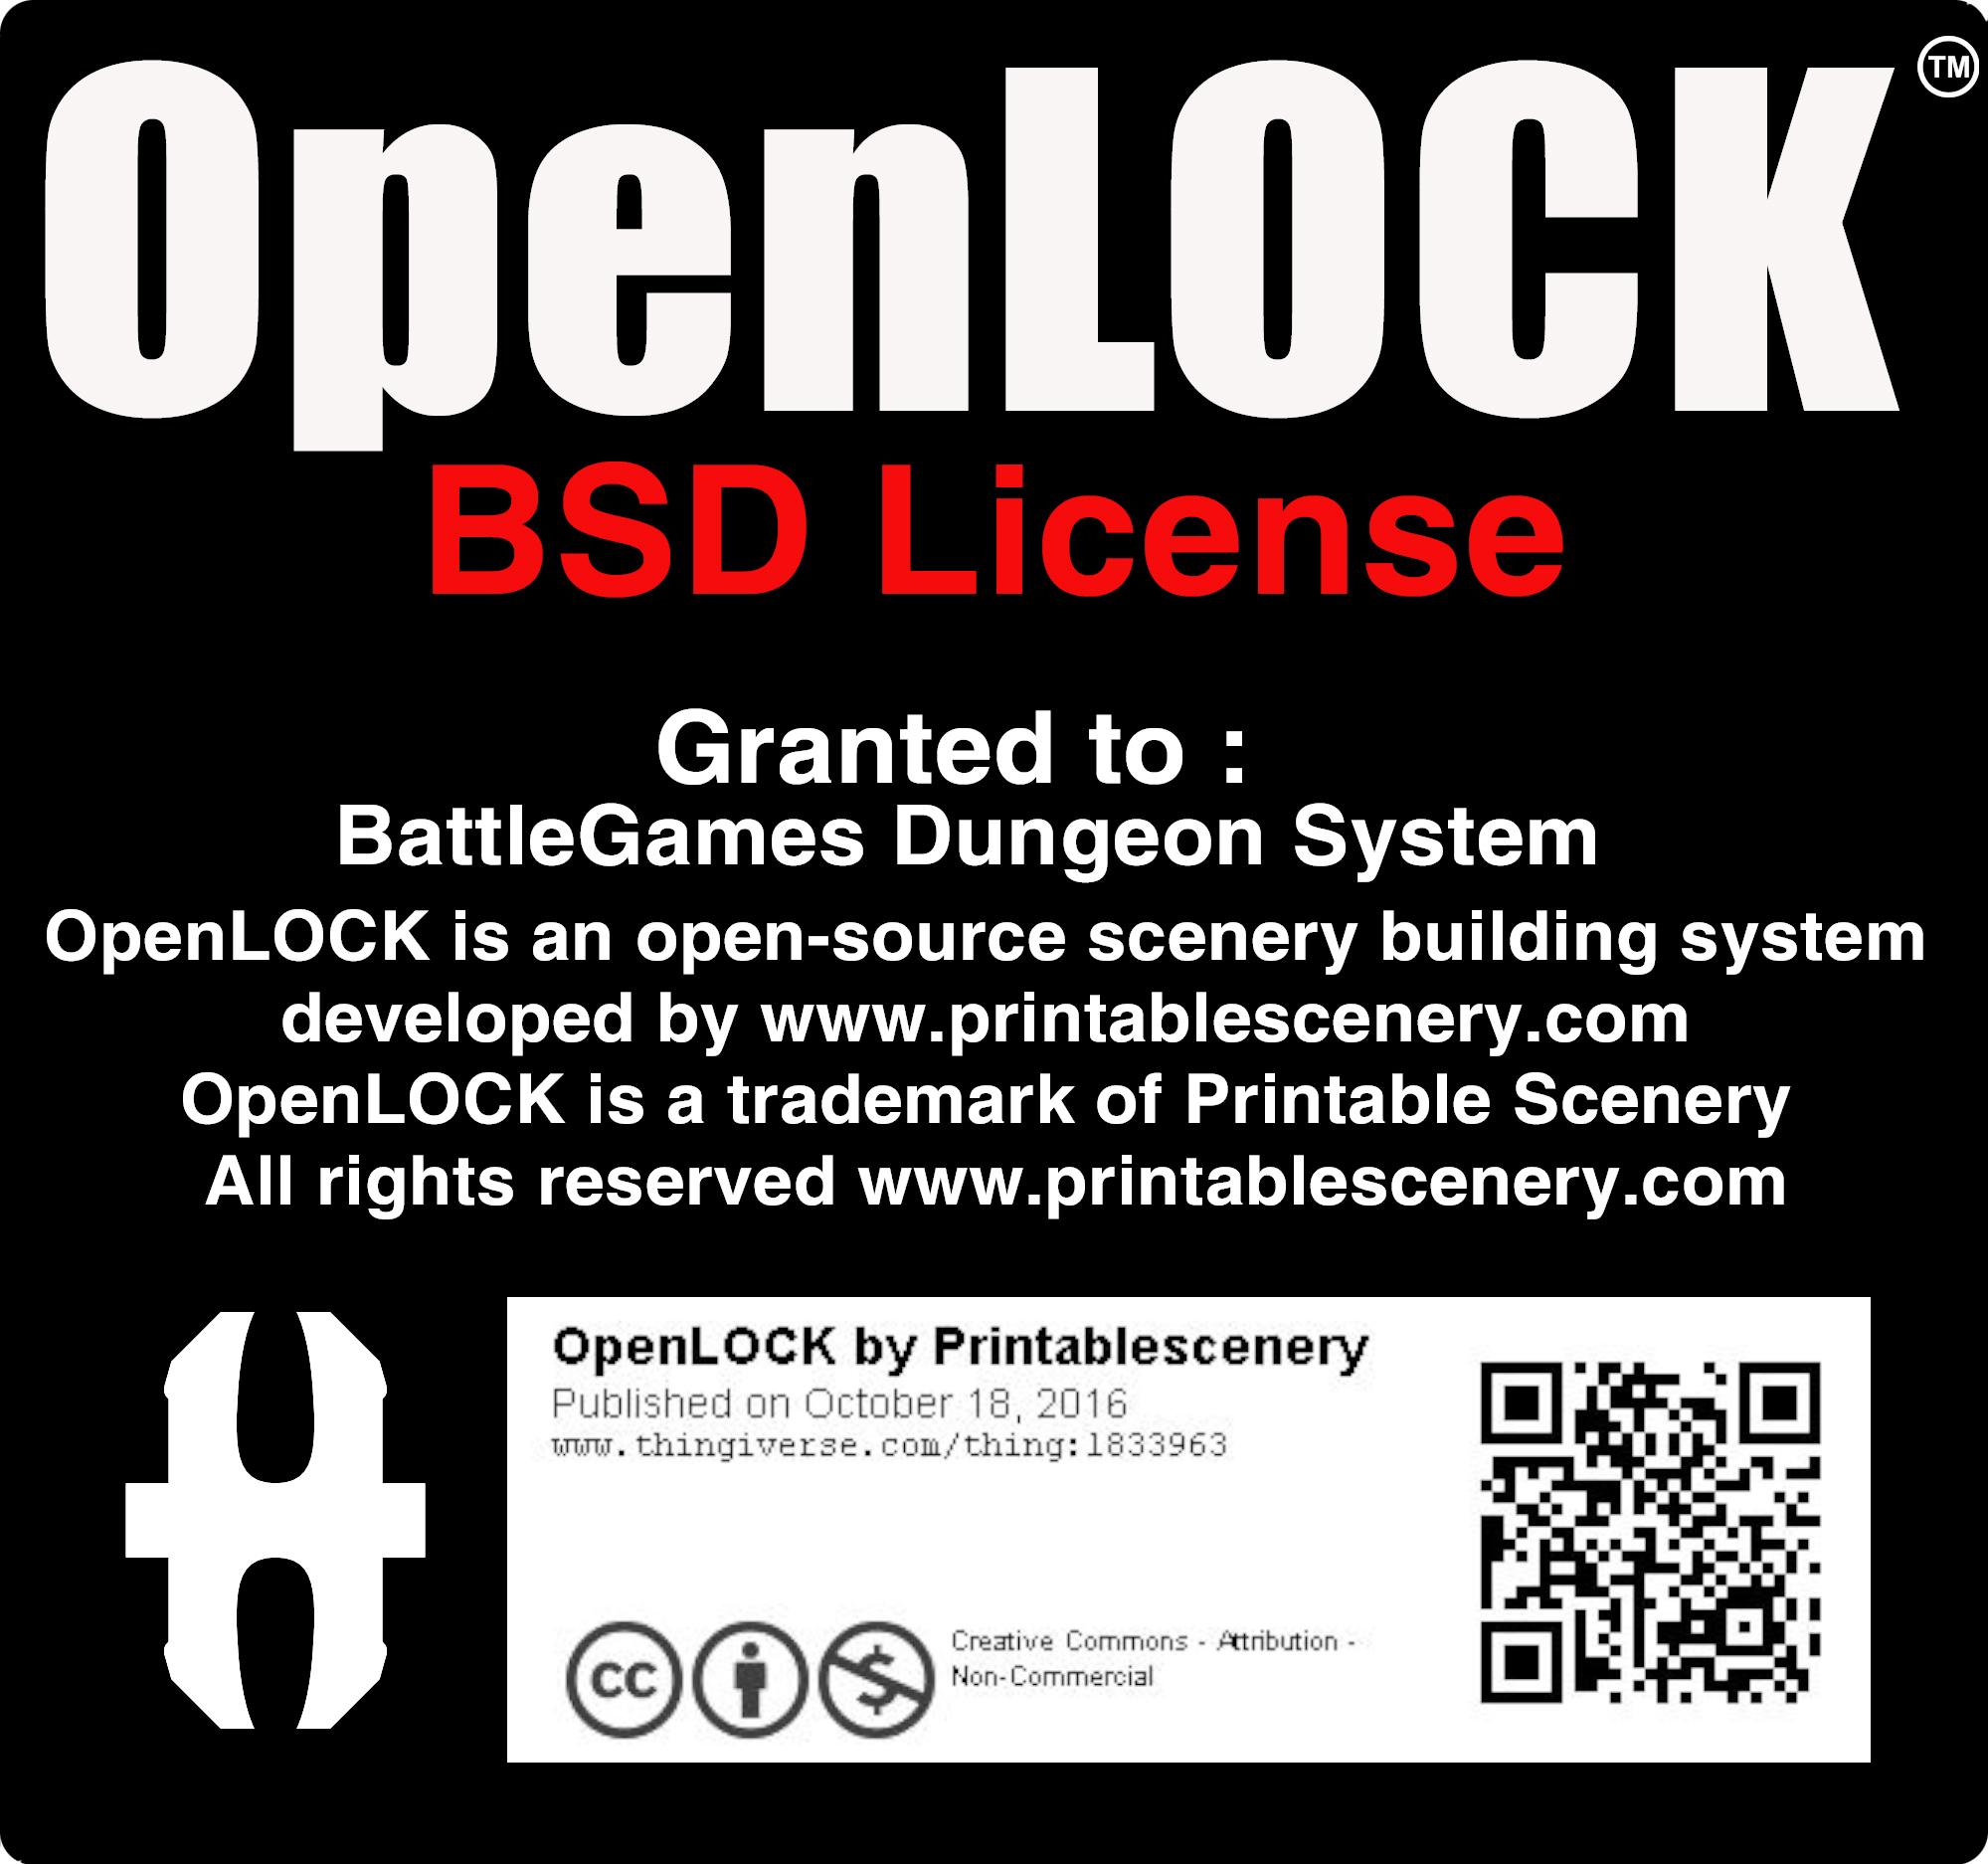 OpenLOCK license